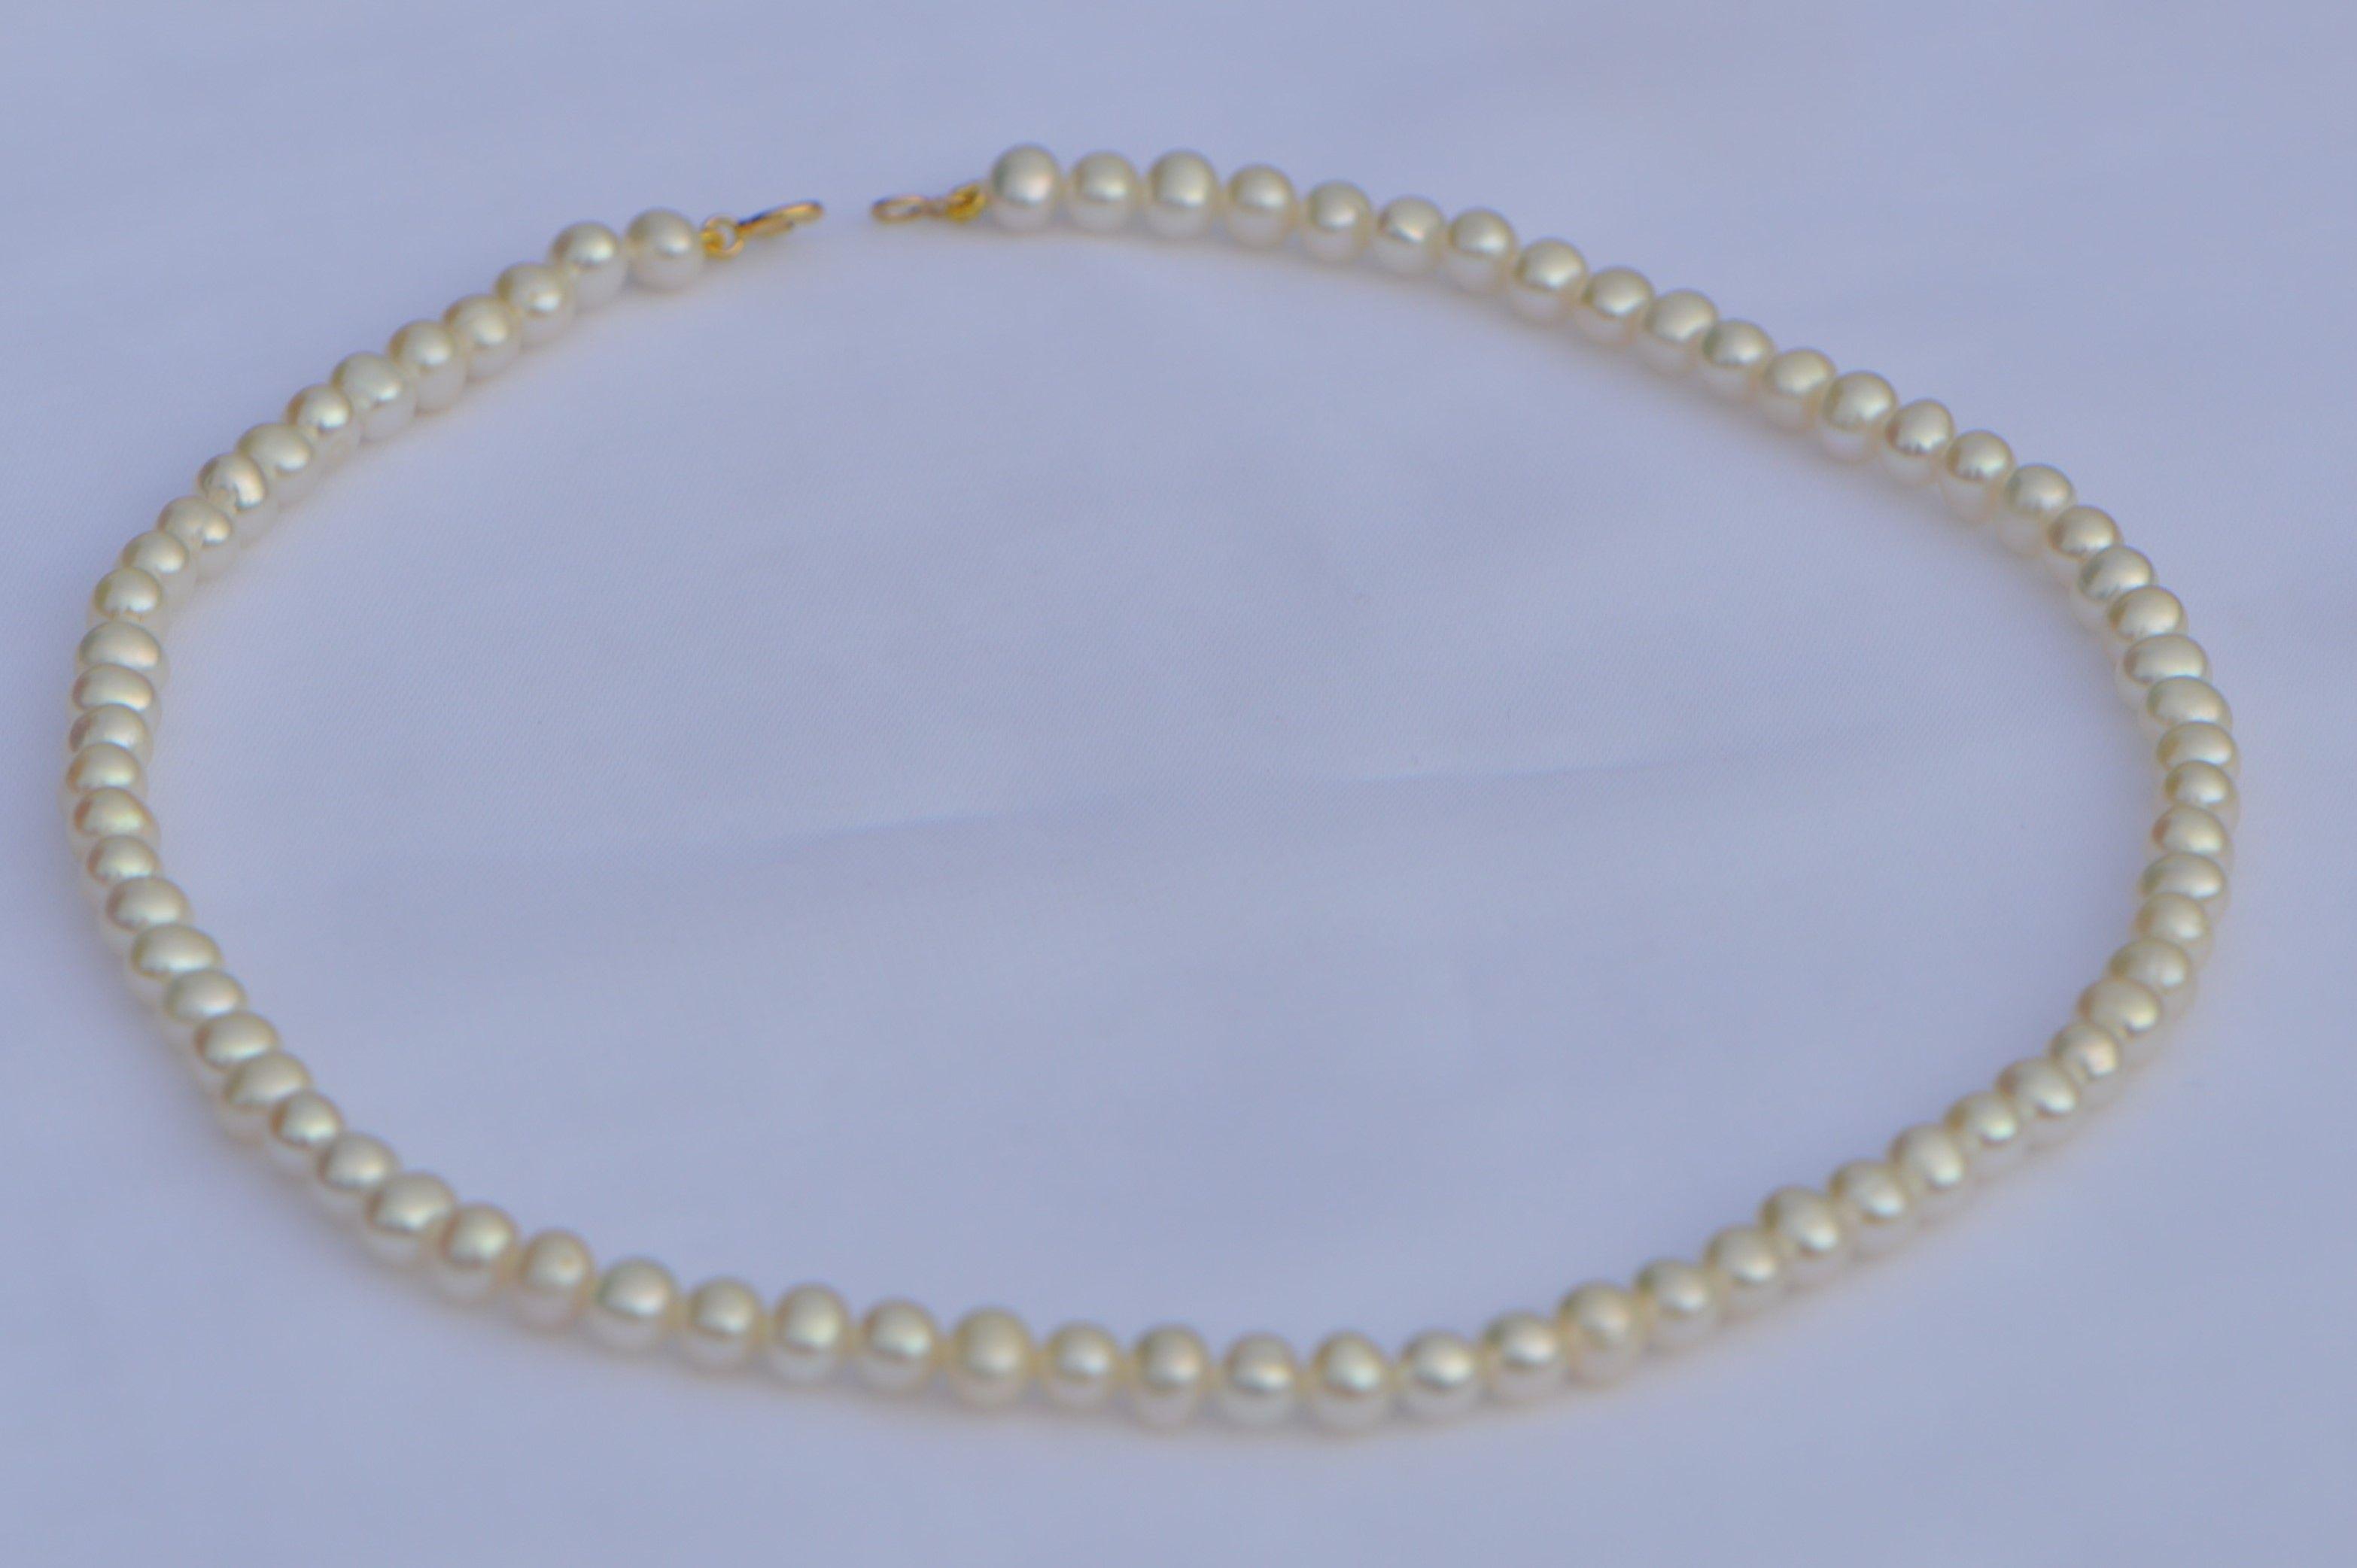 fermoir collier perle de culture